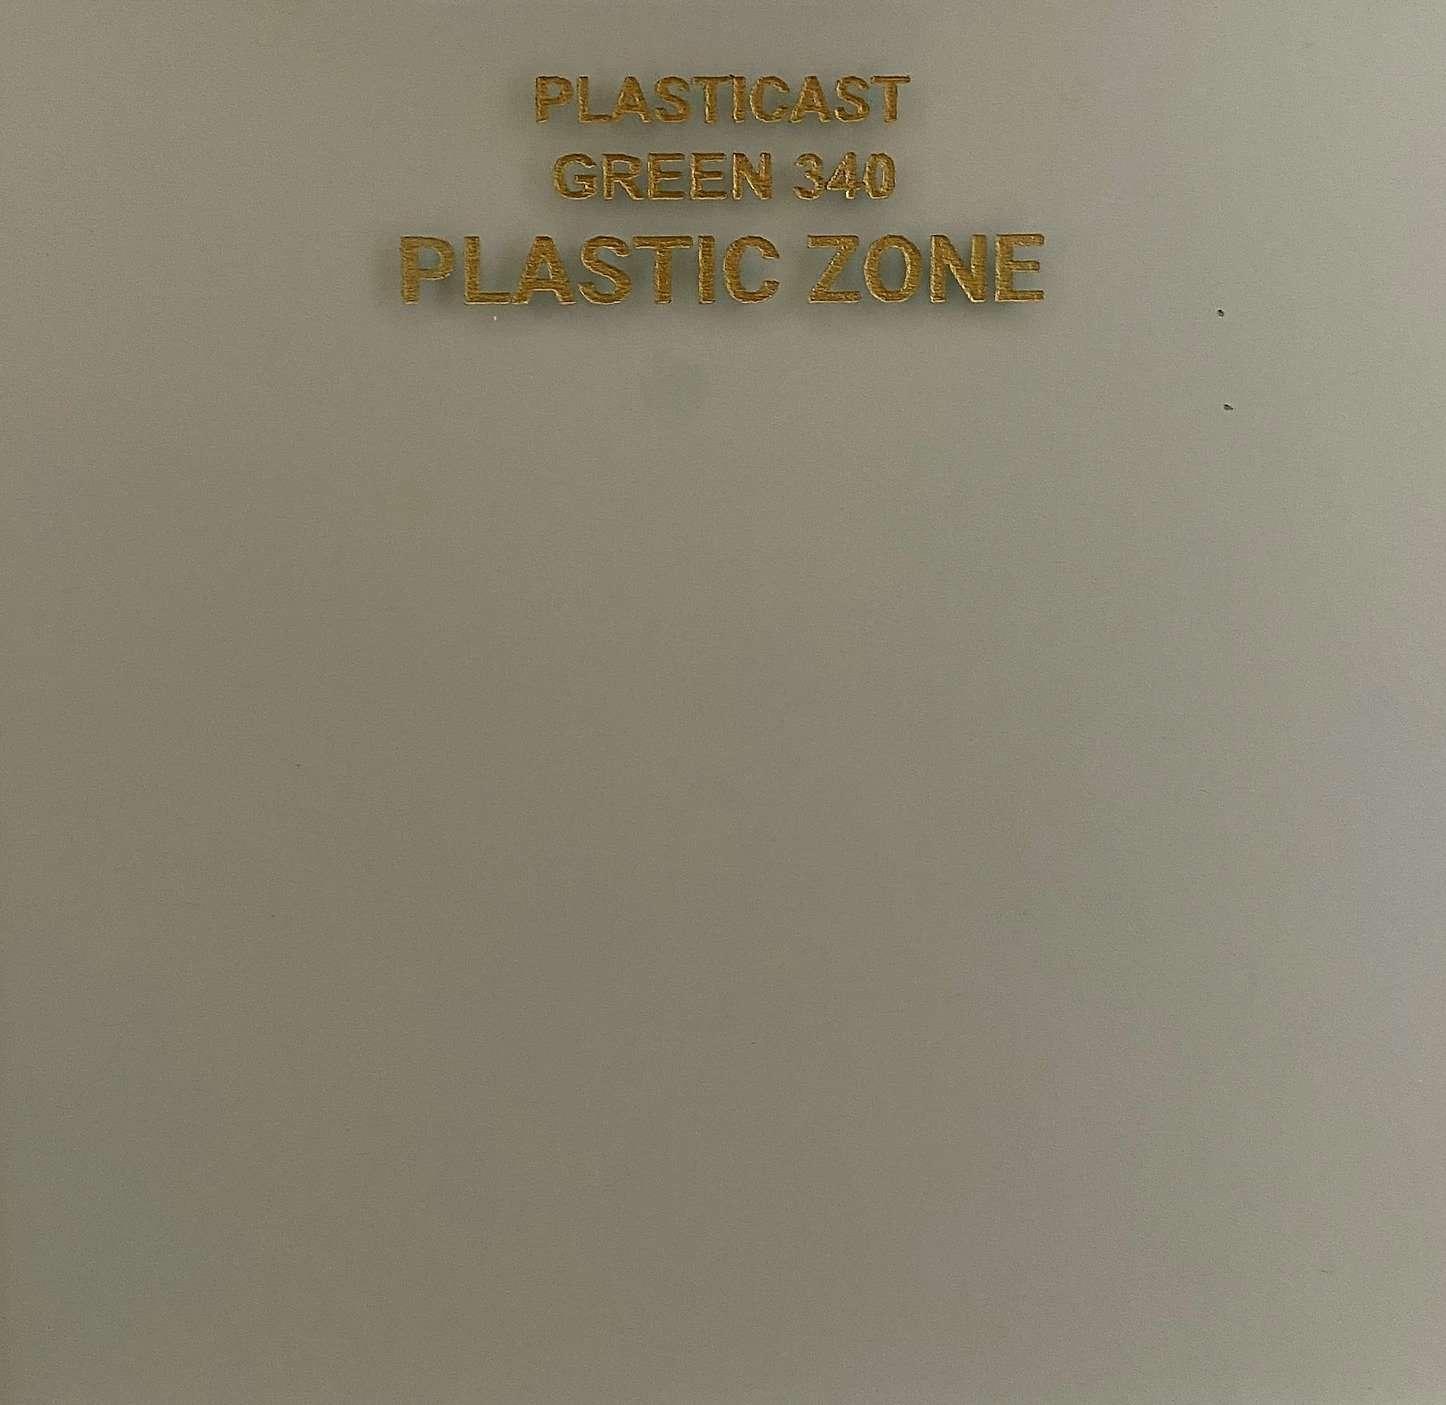 Green 340 acrylic sheet